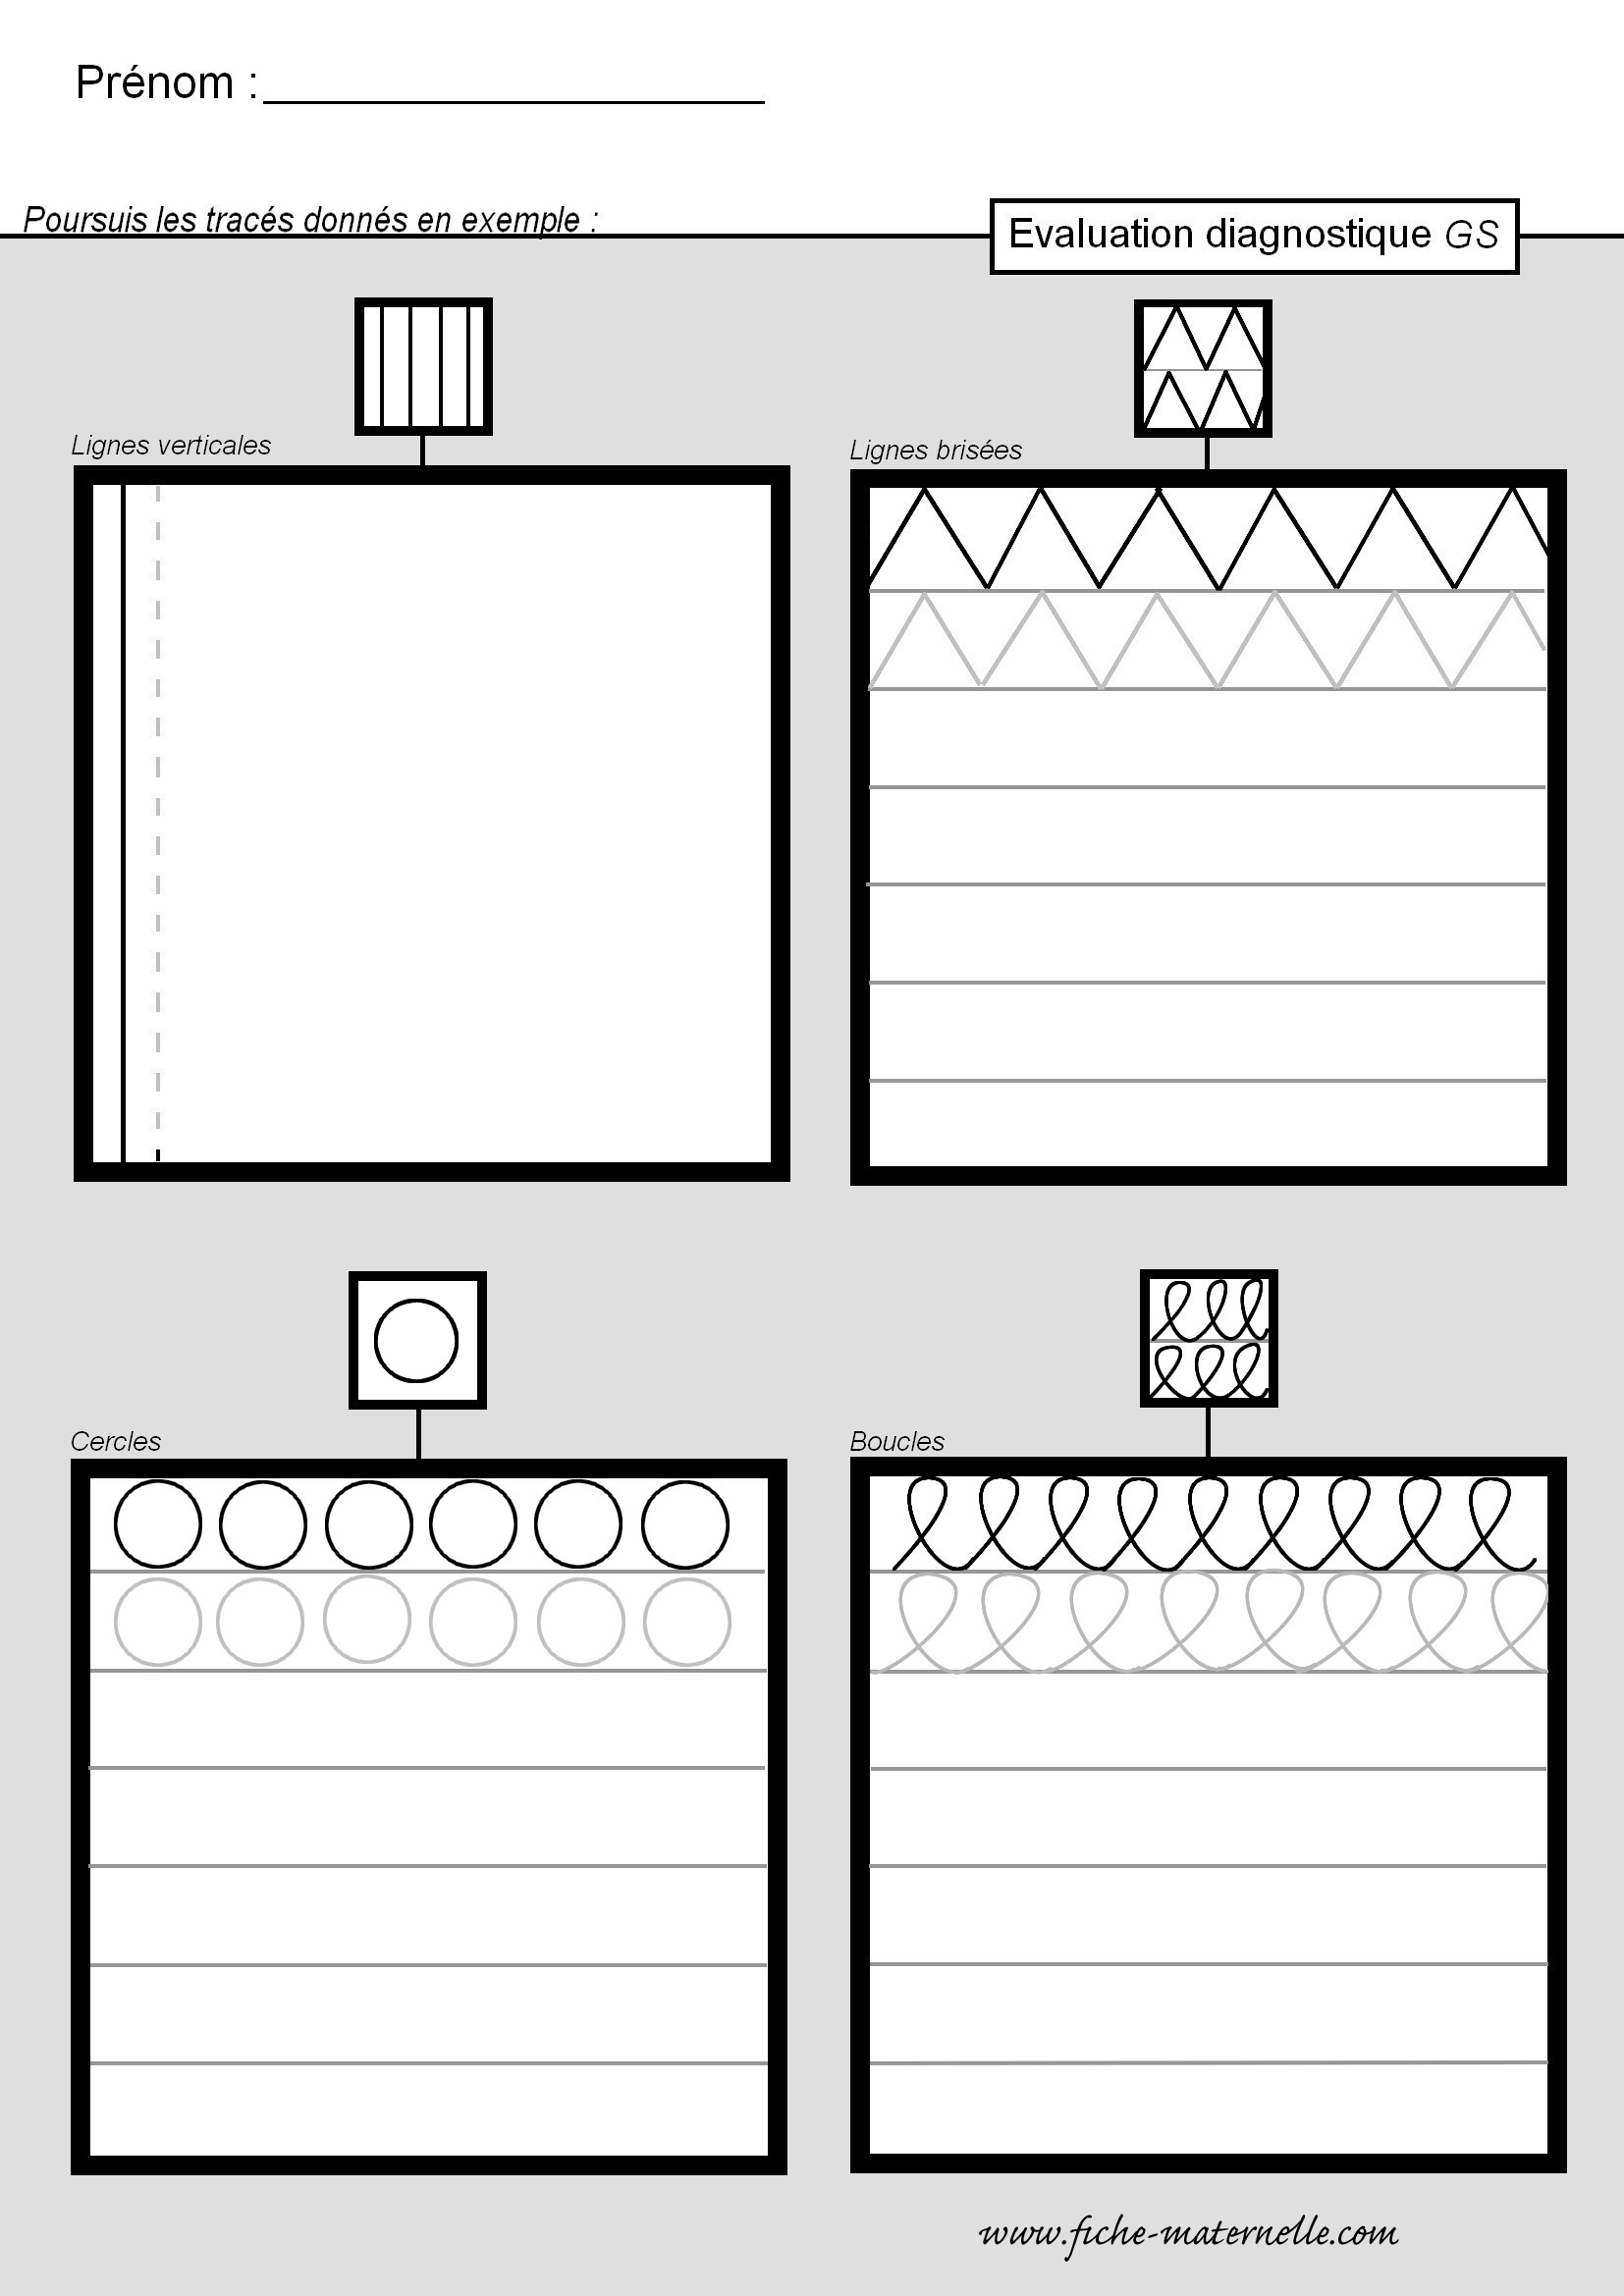 classe maternelle evaluation diagnostique en gs. Black Bedroom Furniture Sets. Home Design Ideas